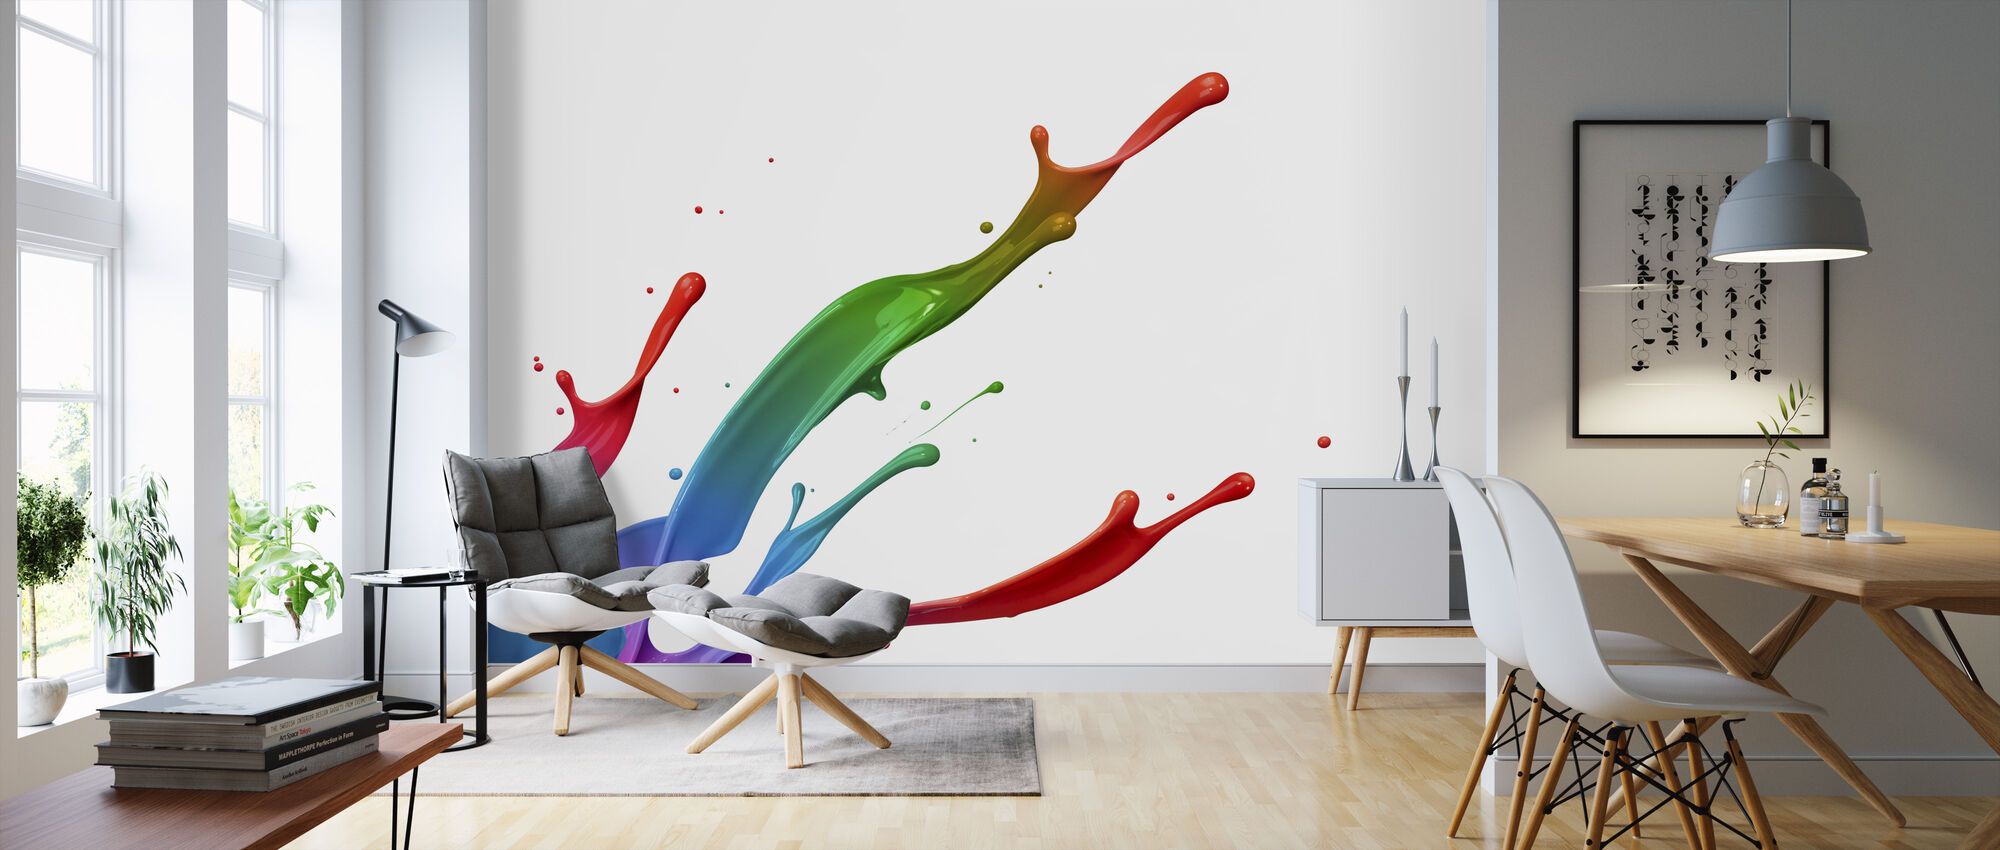 Kleurrijke verf Splash - Behang - Woonkamer